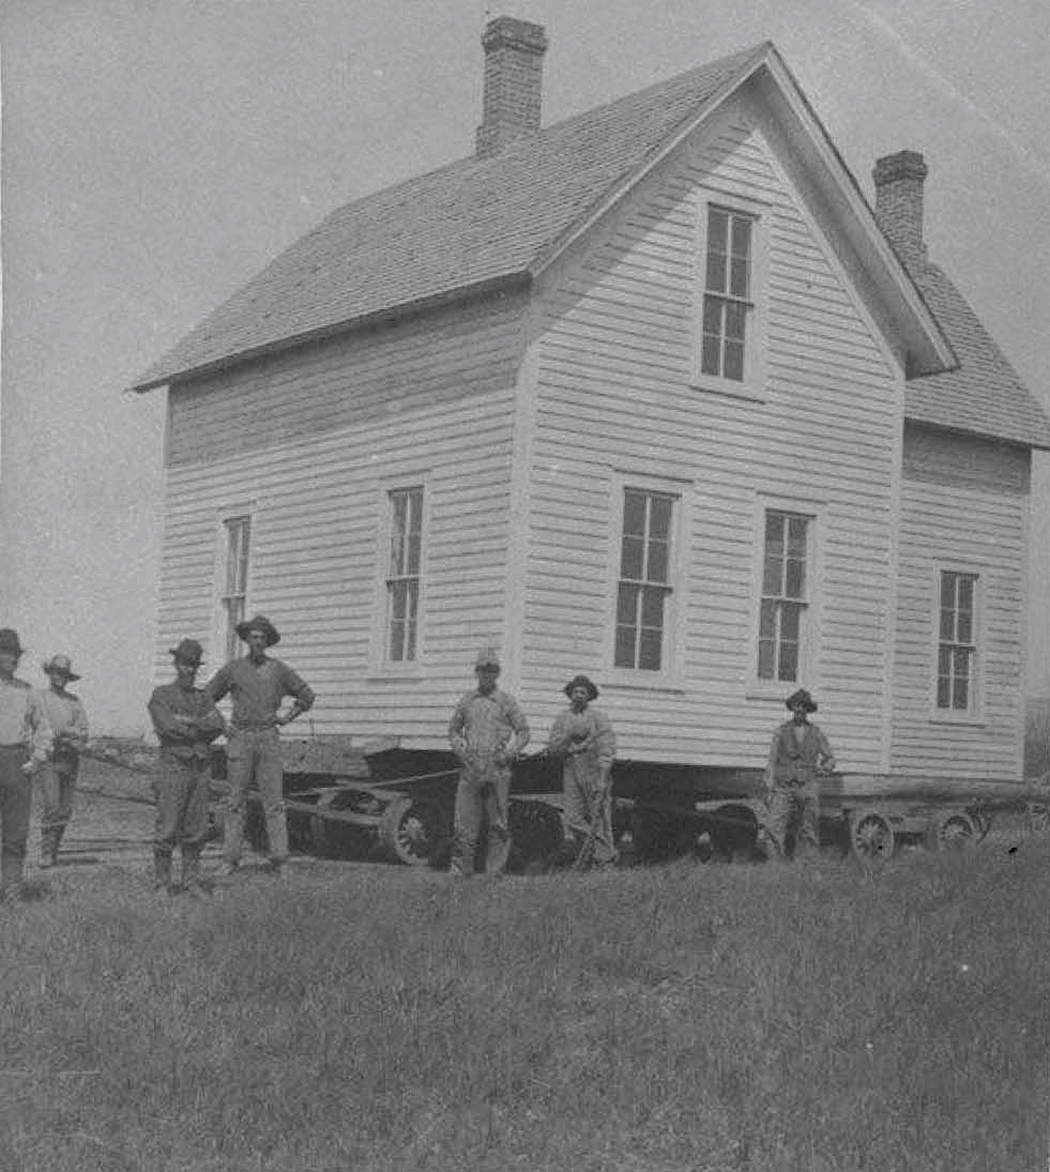 Niobara on Wheels, 1881.